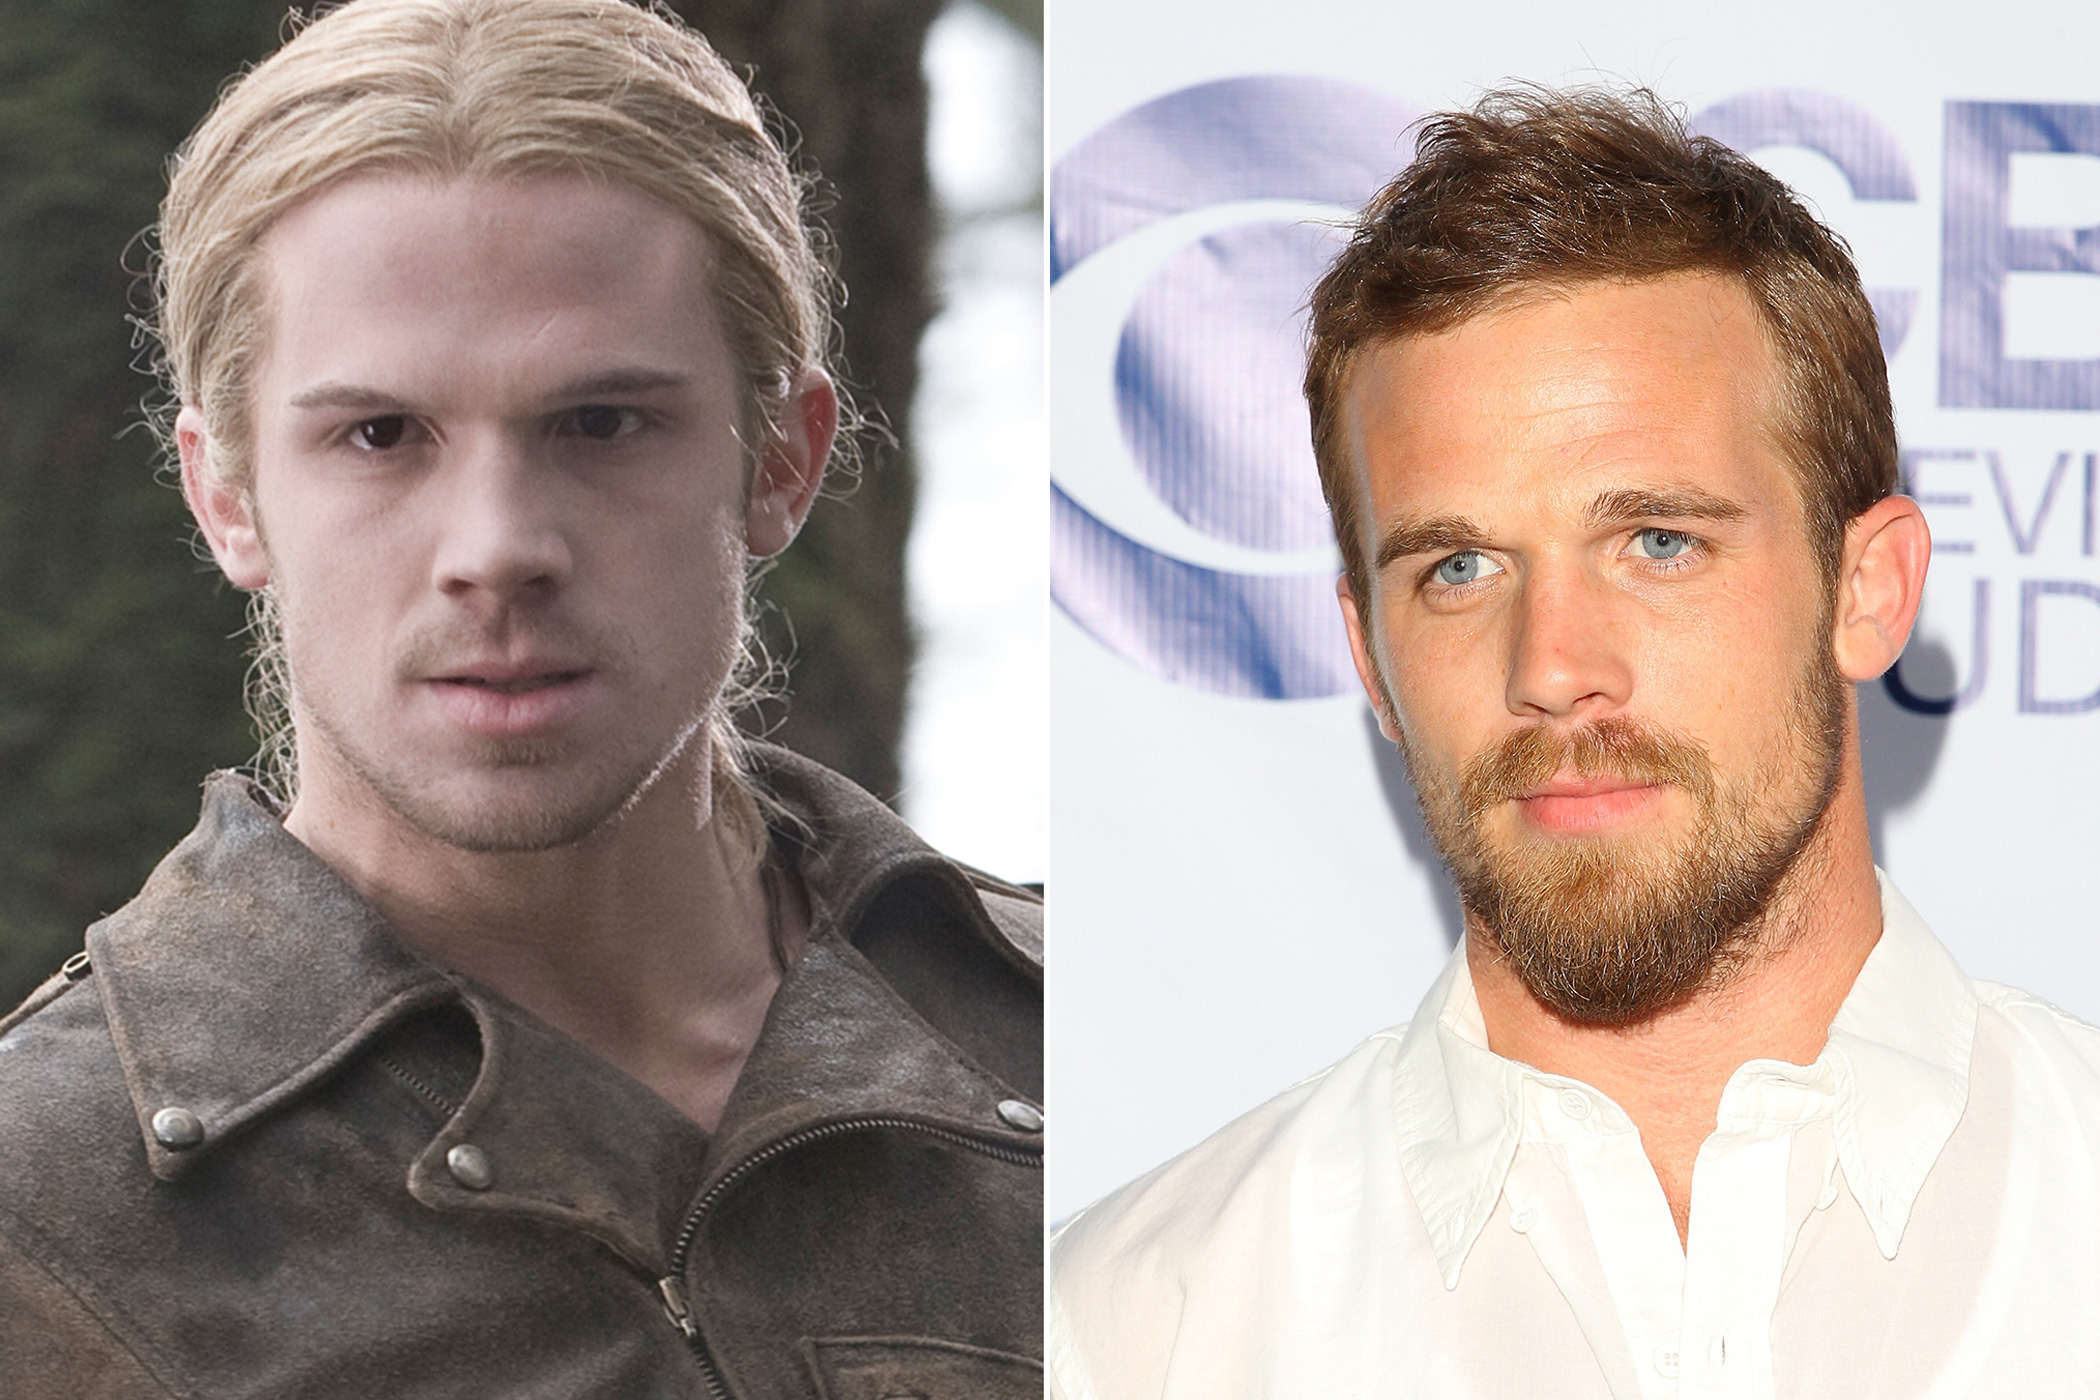 <i>Left</I>: Cam Gigandet as James in <i>Twilight</i>, 2008; <i>Right</i>: in 2014